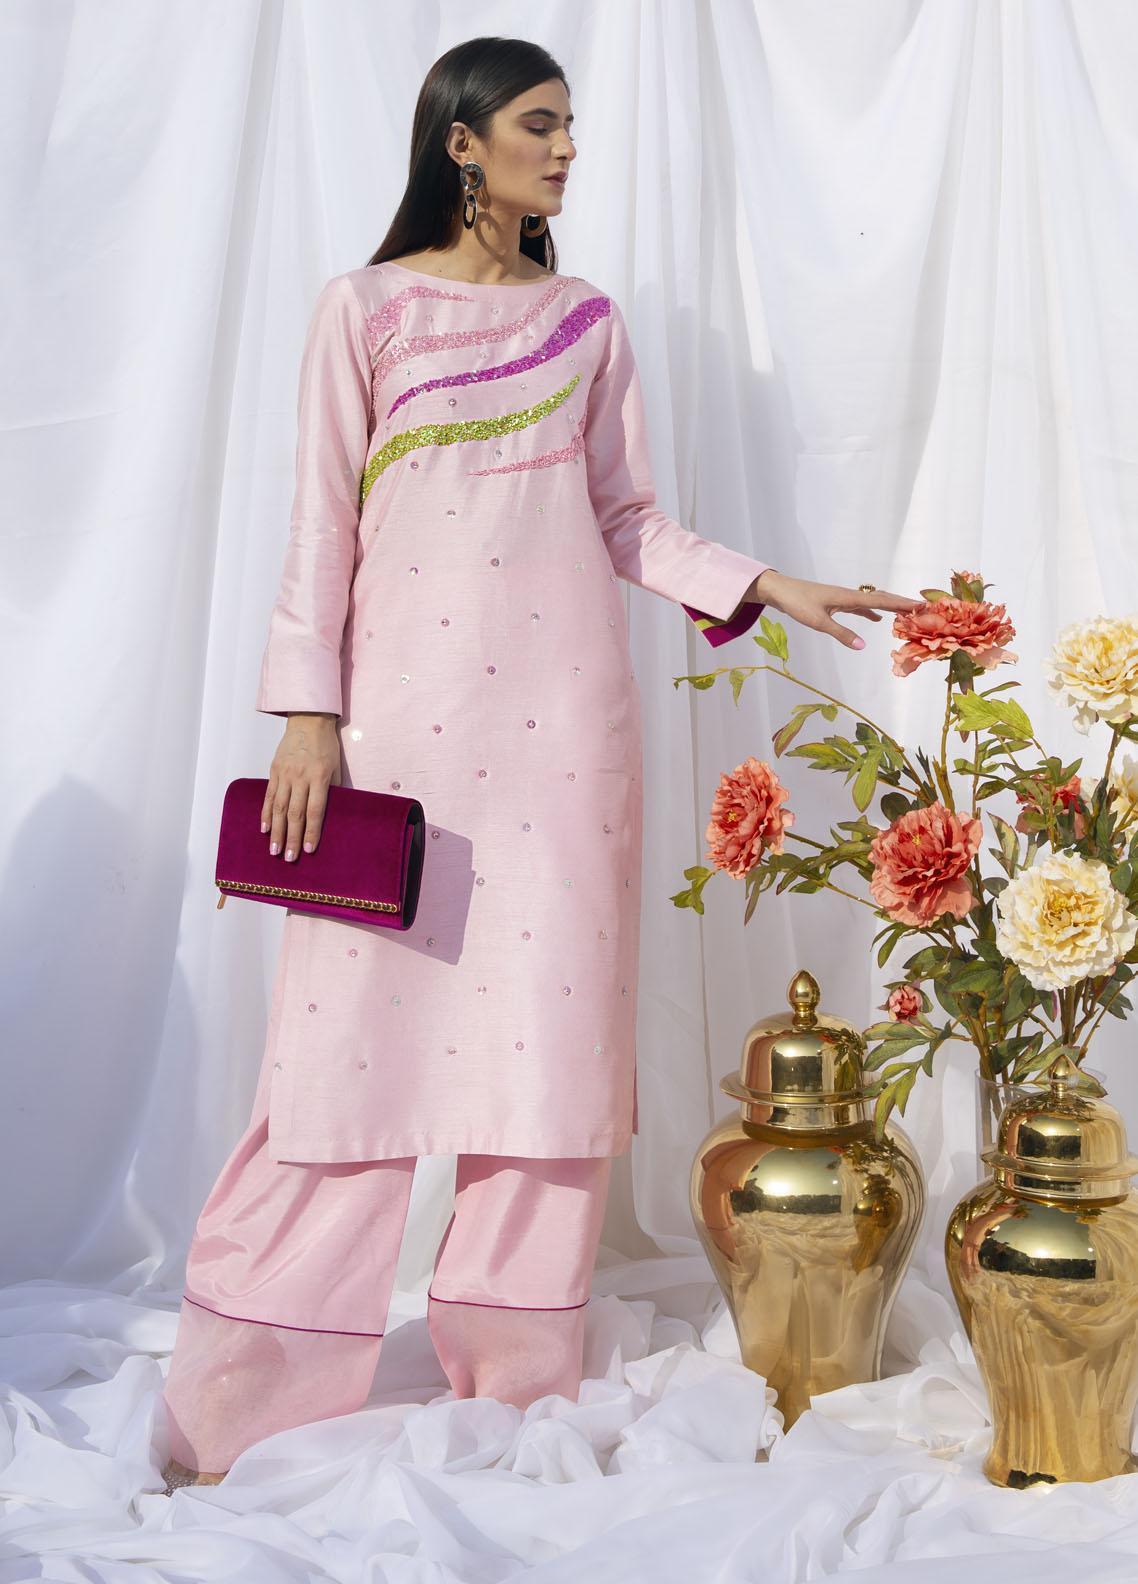 Hana Luxury Pret Embroidered Raw Silk 2 Piece Dress Curvy Candy